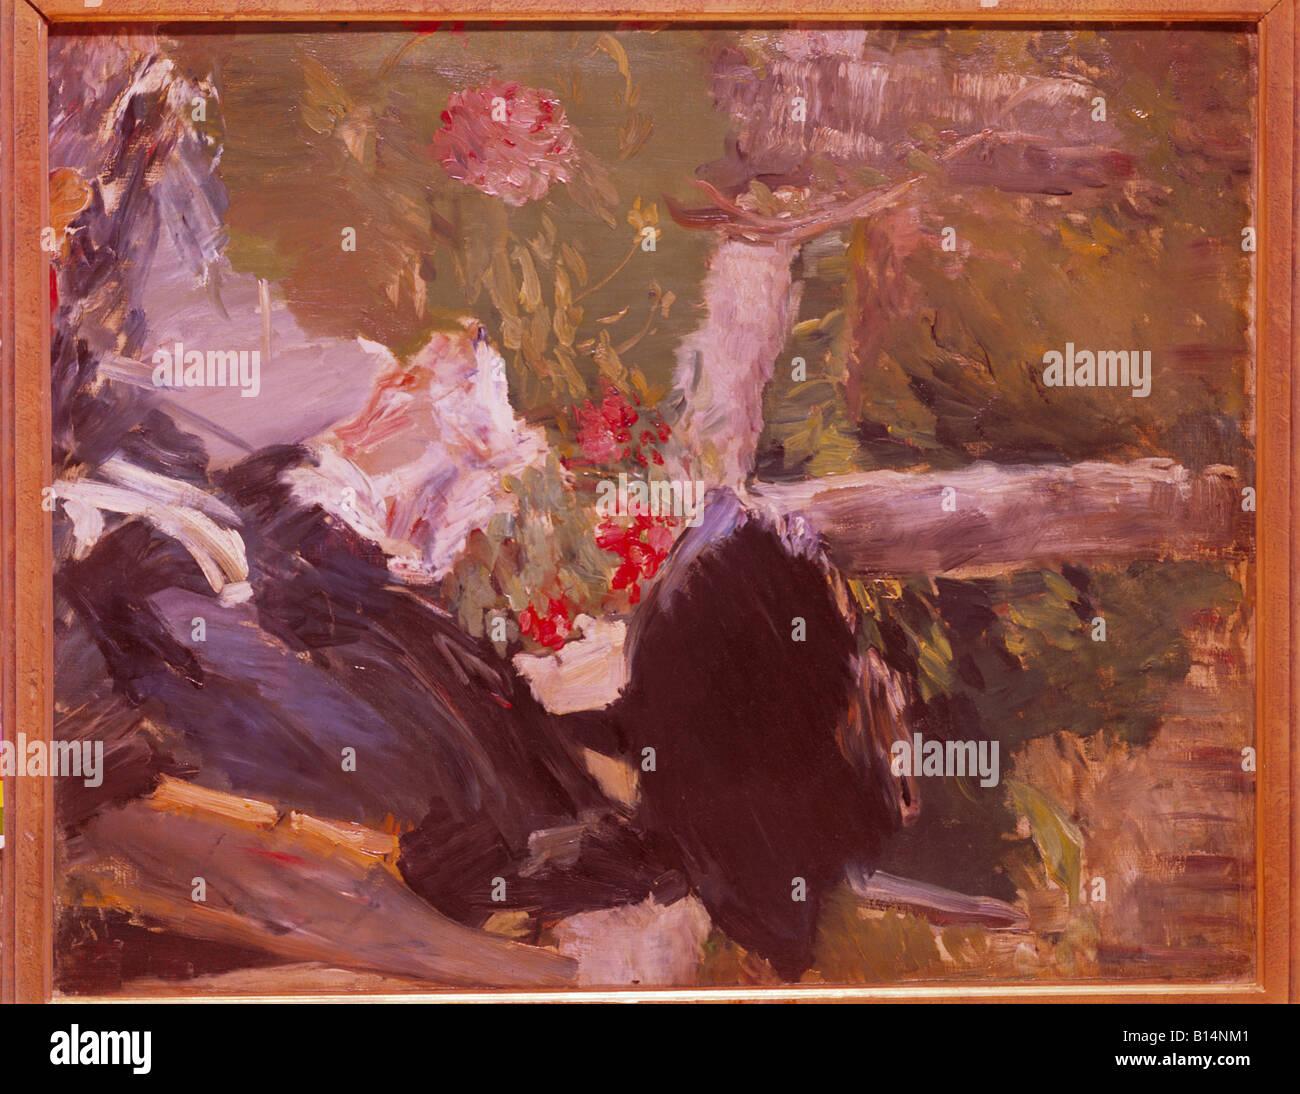 "Bellas artes, Manet, Edouard, (1832 -1883), pintura, ""La mera de Manet dans le jardin de Bellevue' ('Manet 's madre Foto de stock"